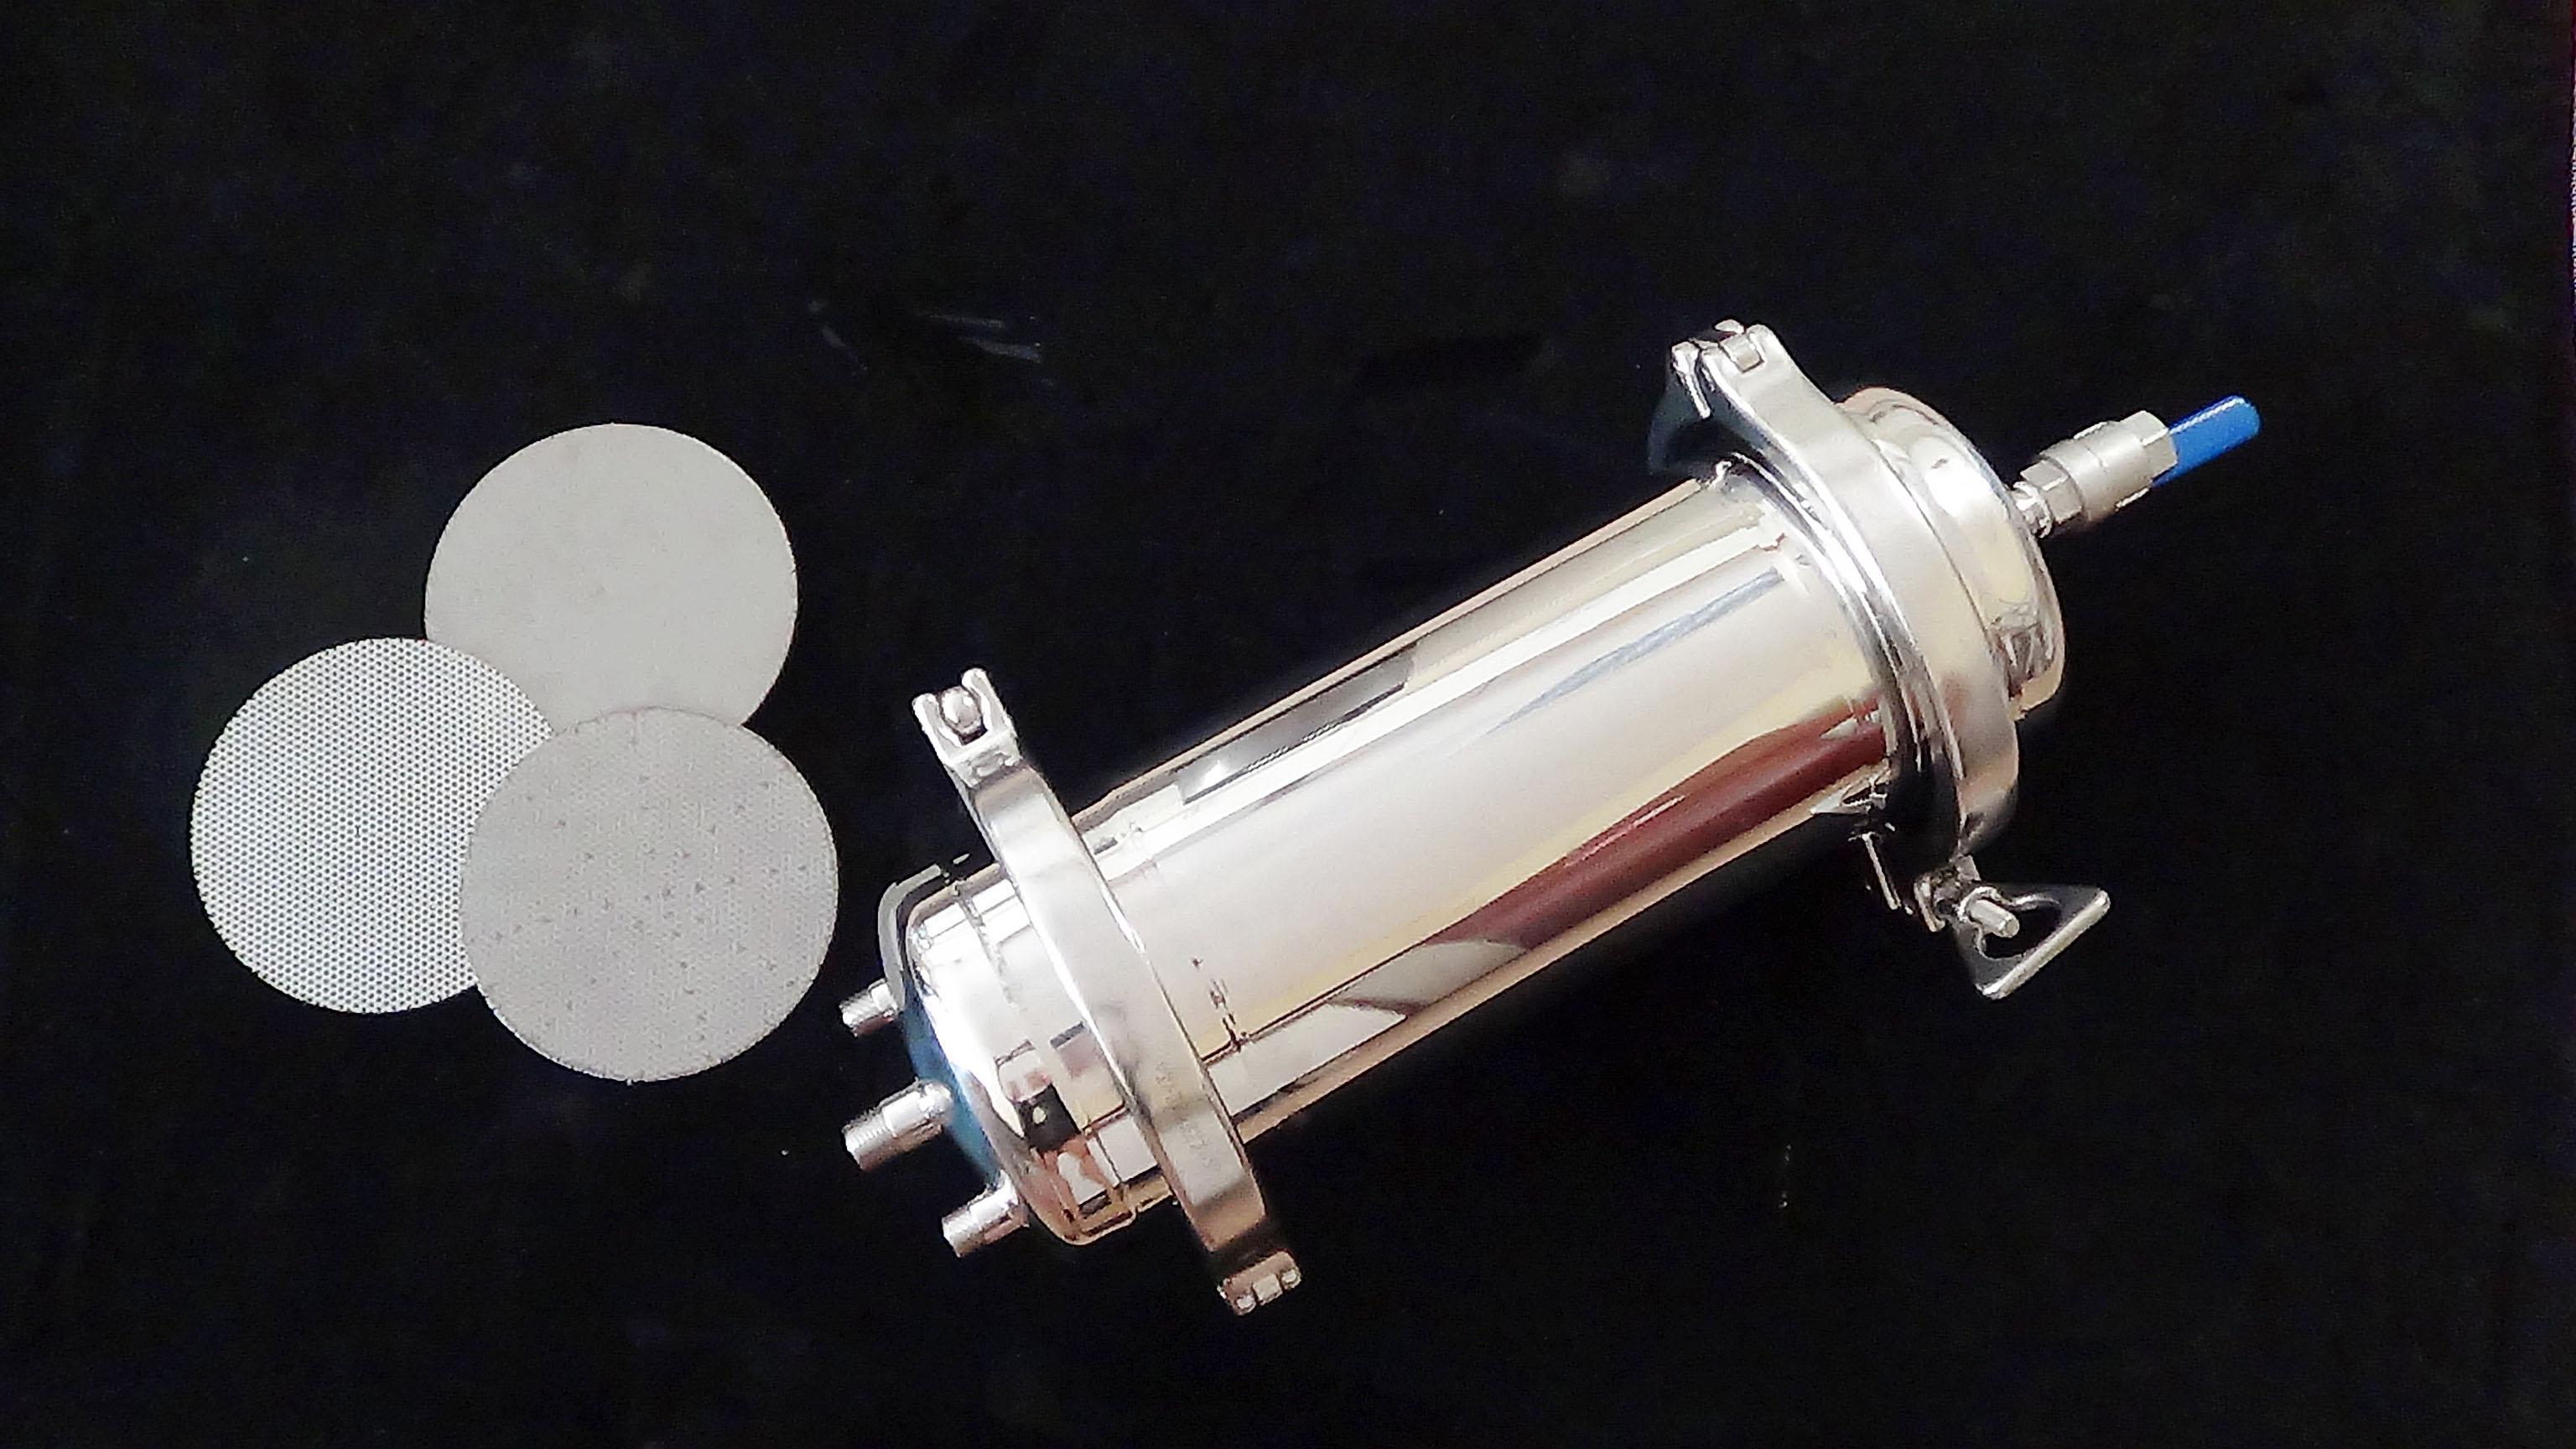 nucza filtracyjna laboratorium B&R